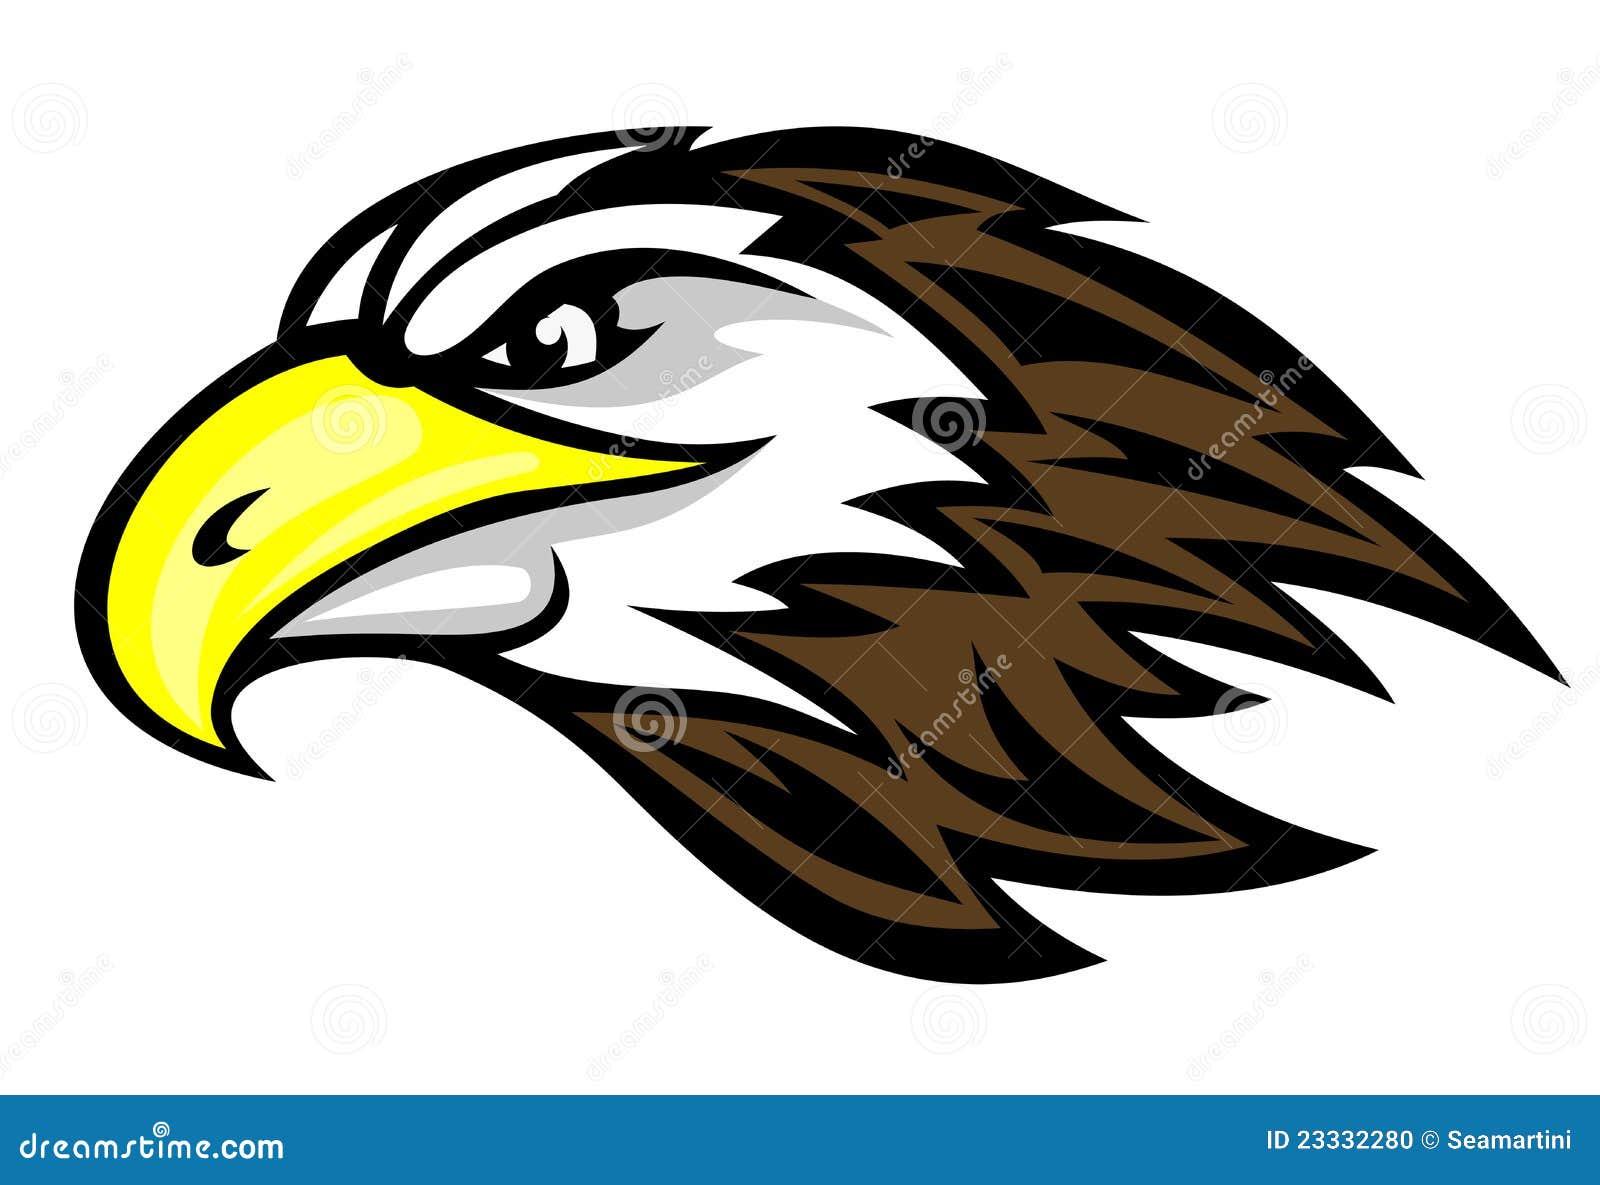 Faucon de dessin anim photo stock image 23332280 - Dessiner un faucon ...